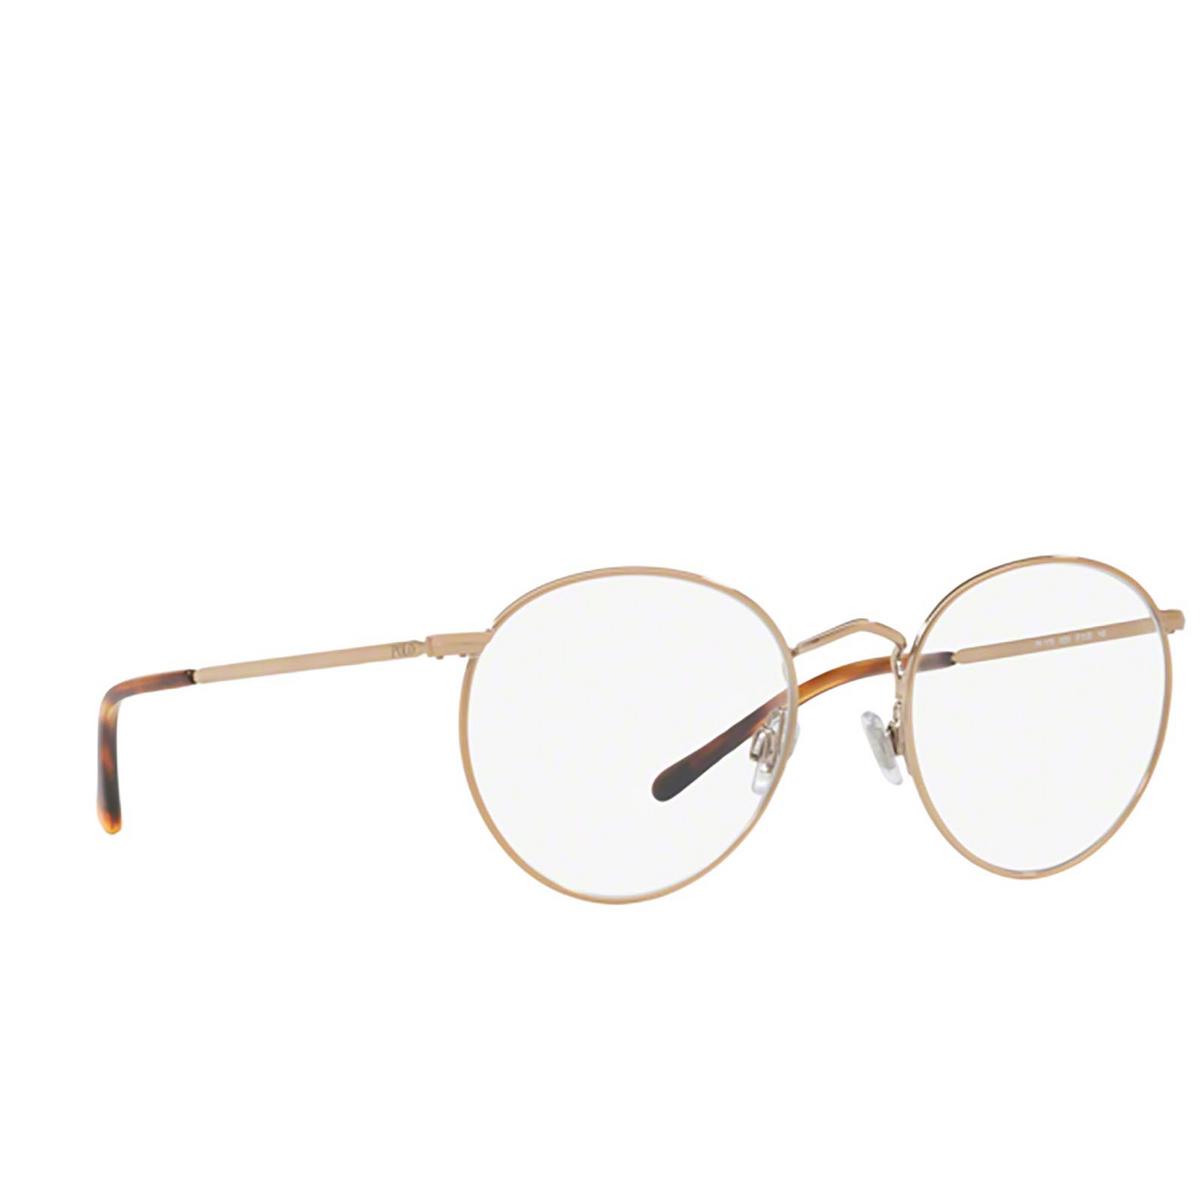 Polo Ralph Lauren® Round Eyeglasses: PH1179 color Shiny Dark Rose Gold 9334 - three-quarters view.